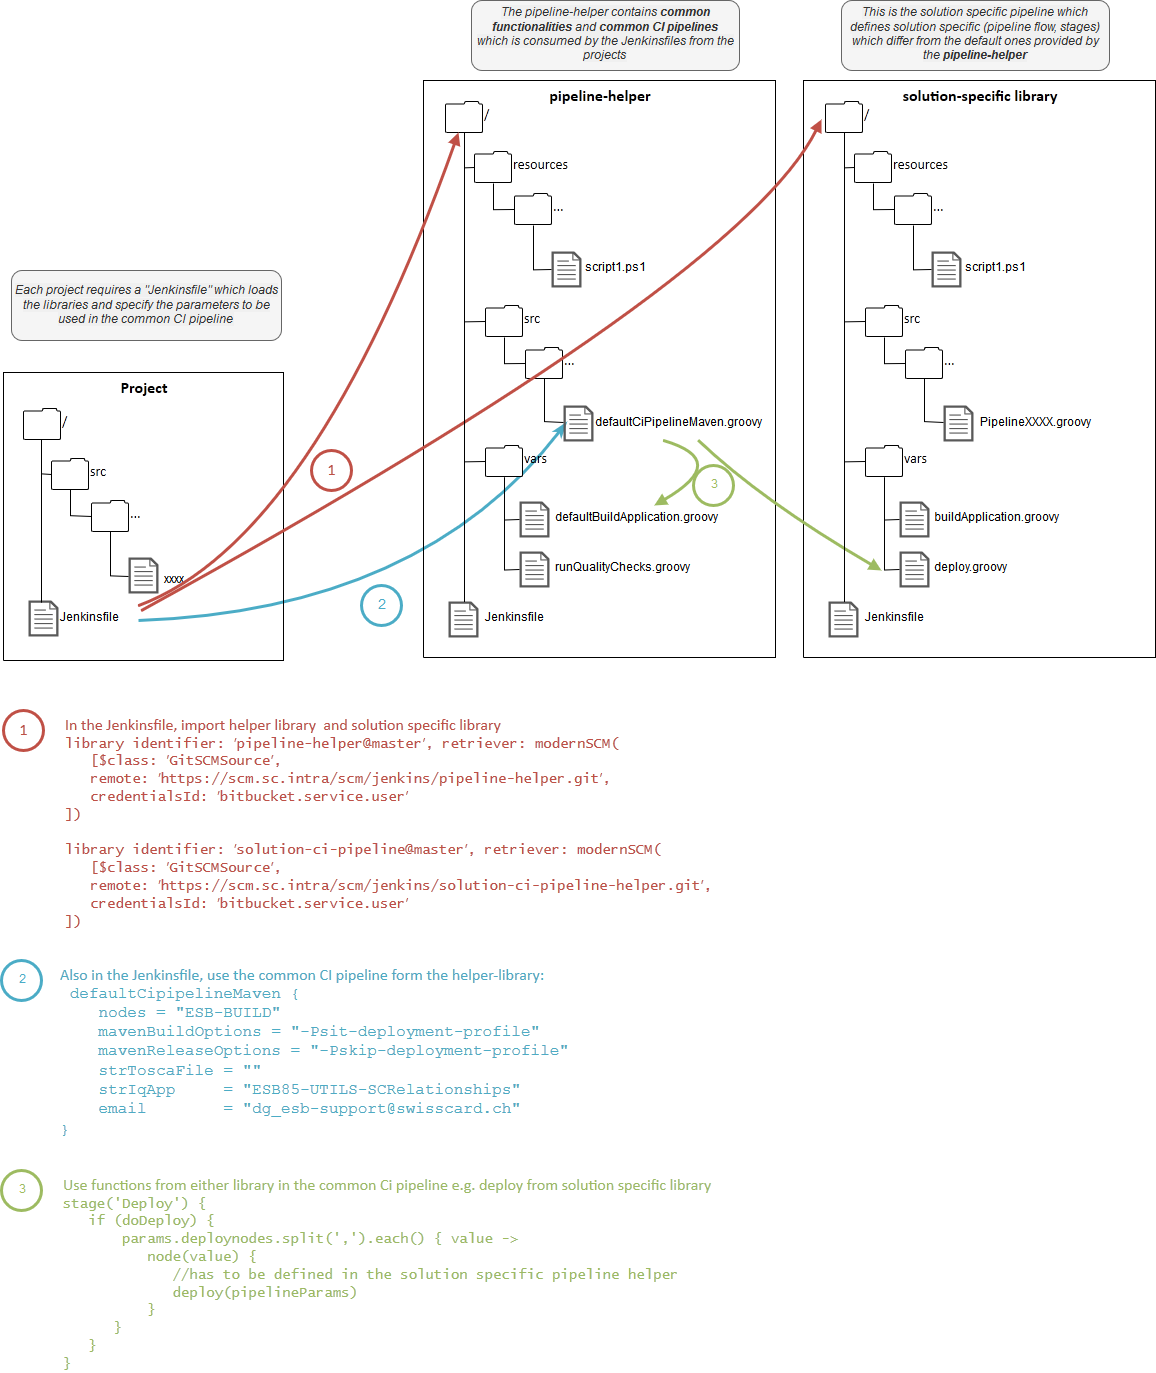 concept of common ci pipelines